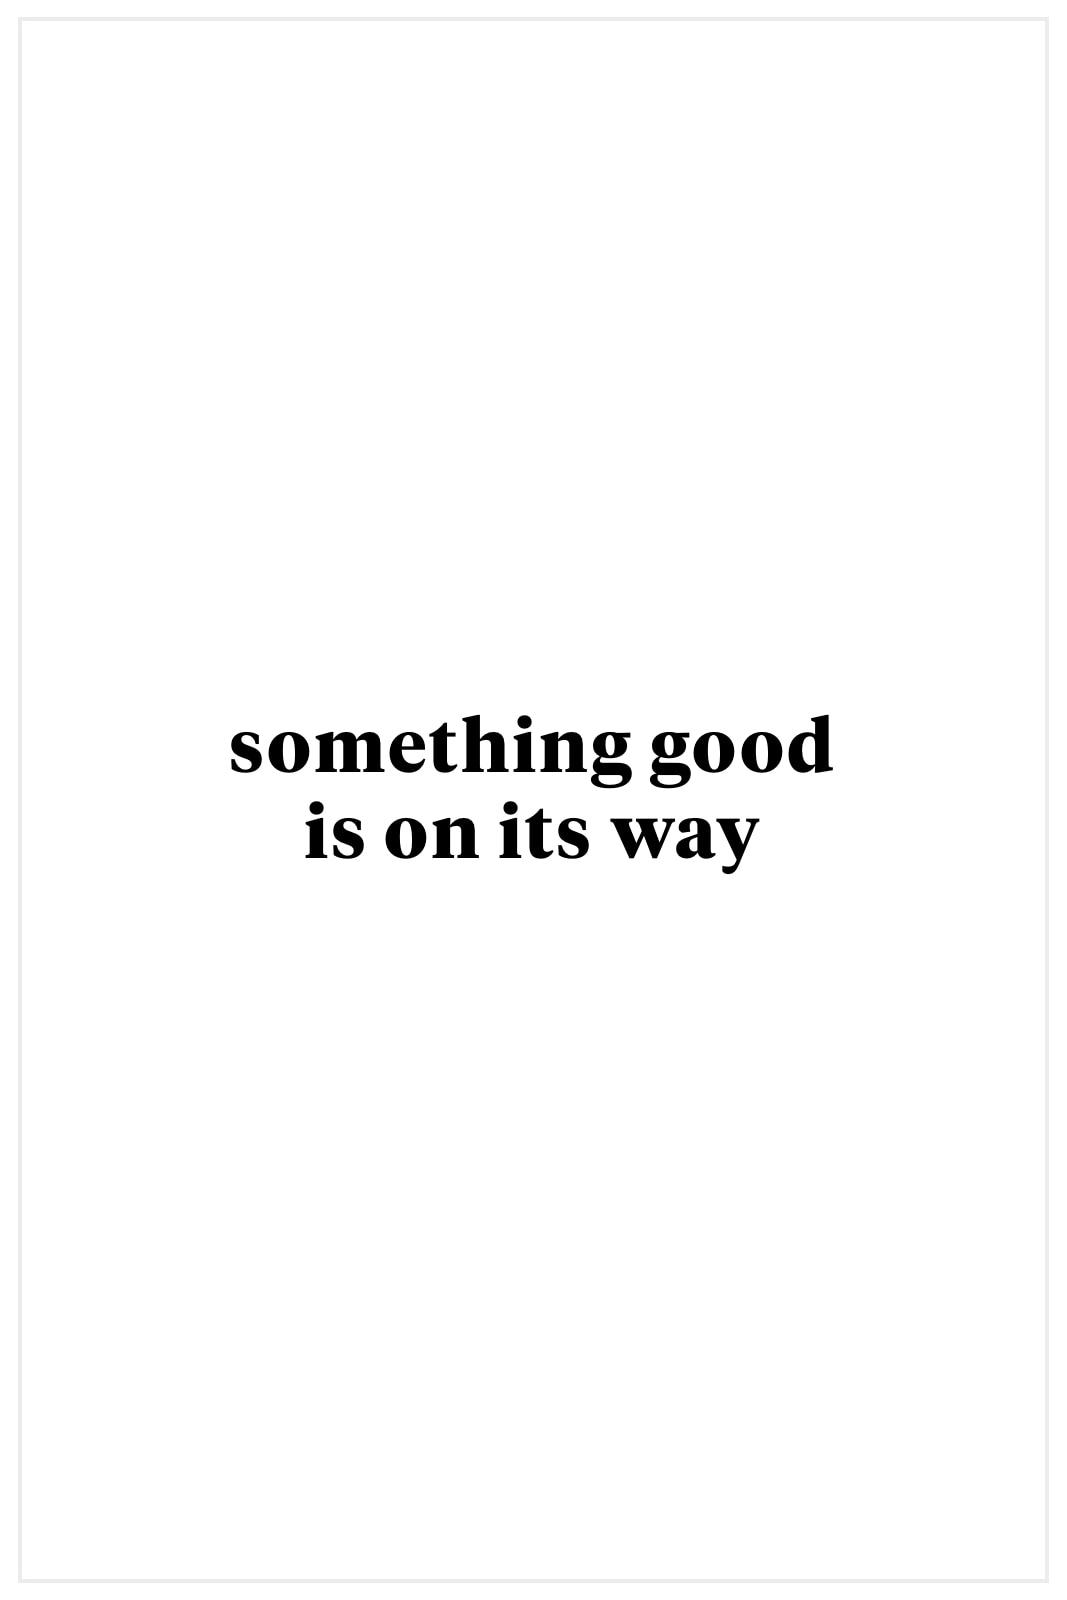 Camila Ikat V Neck Sweatshirt